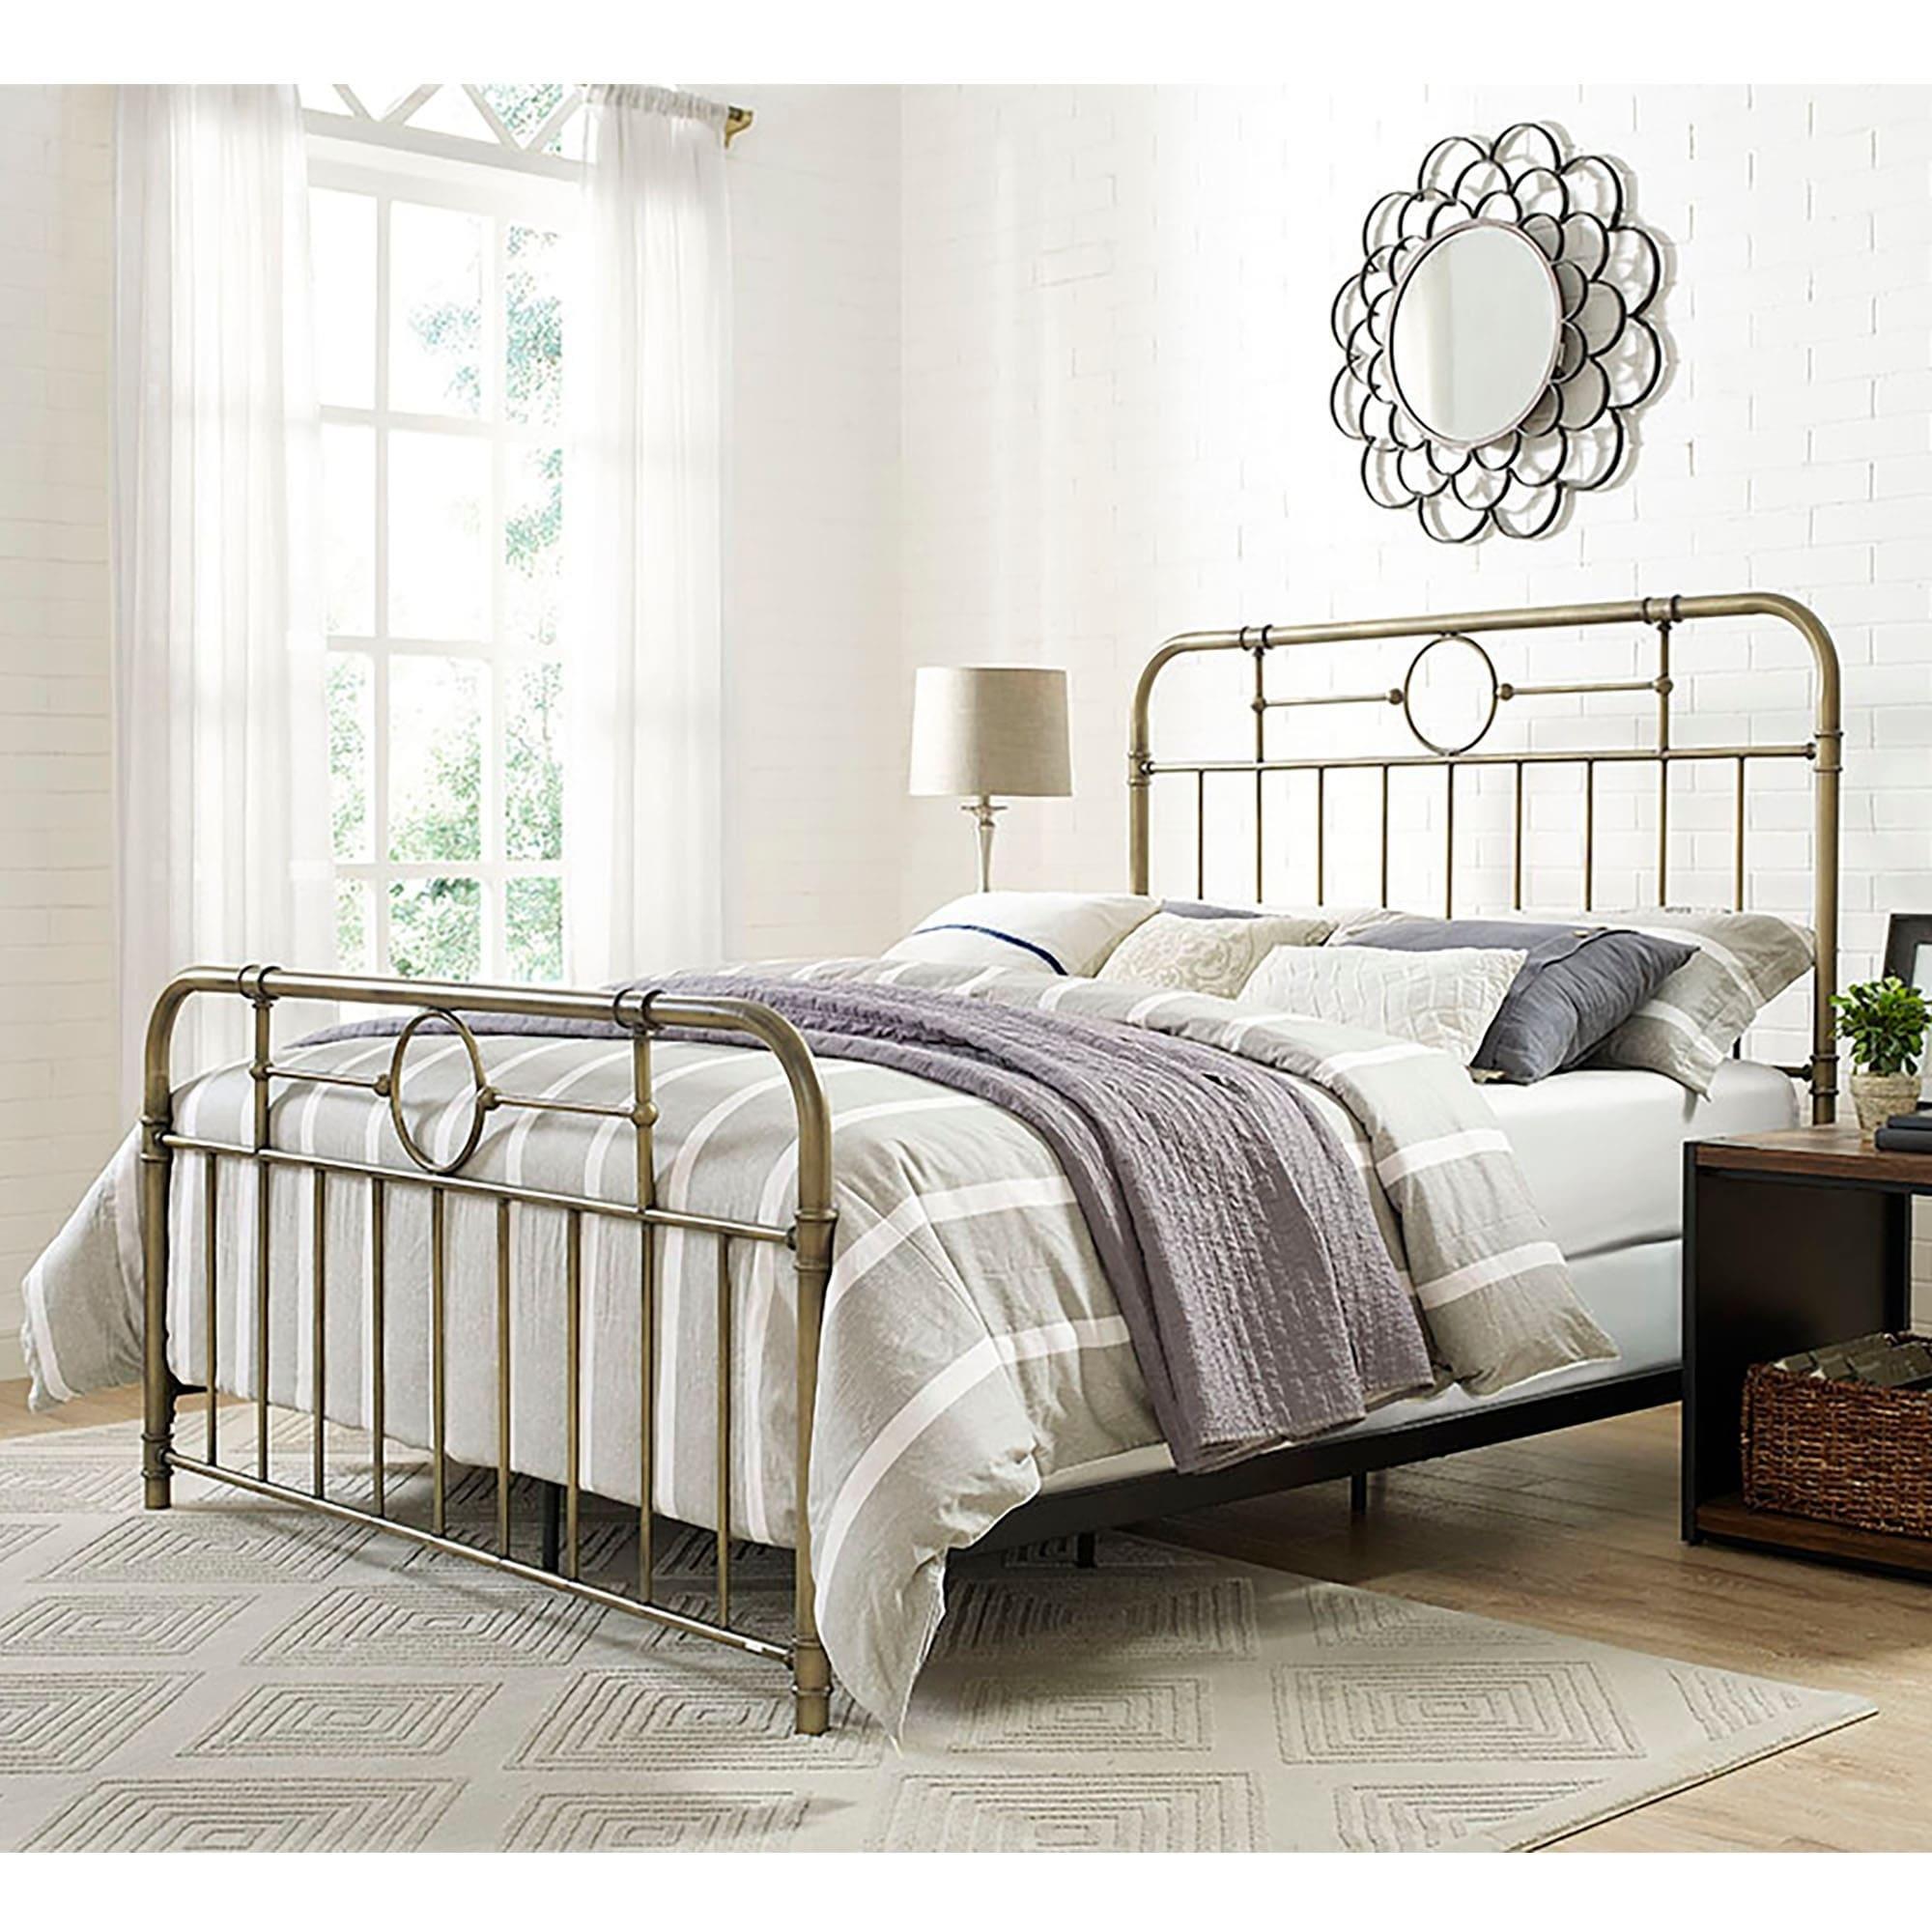 Bronze Pipe Metal Bed